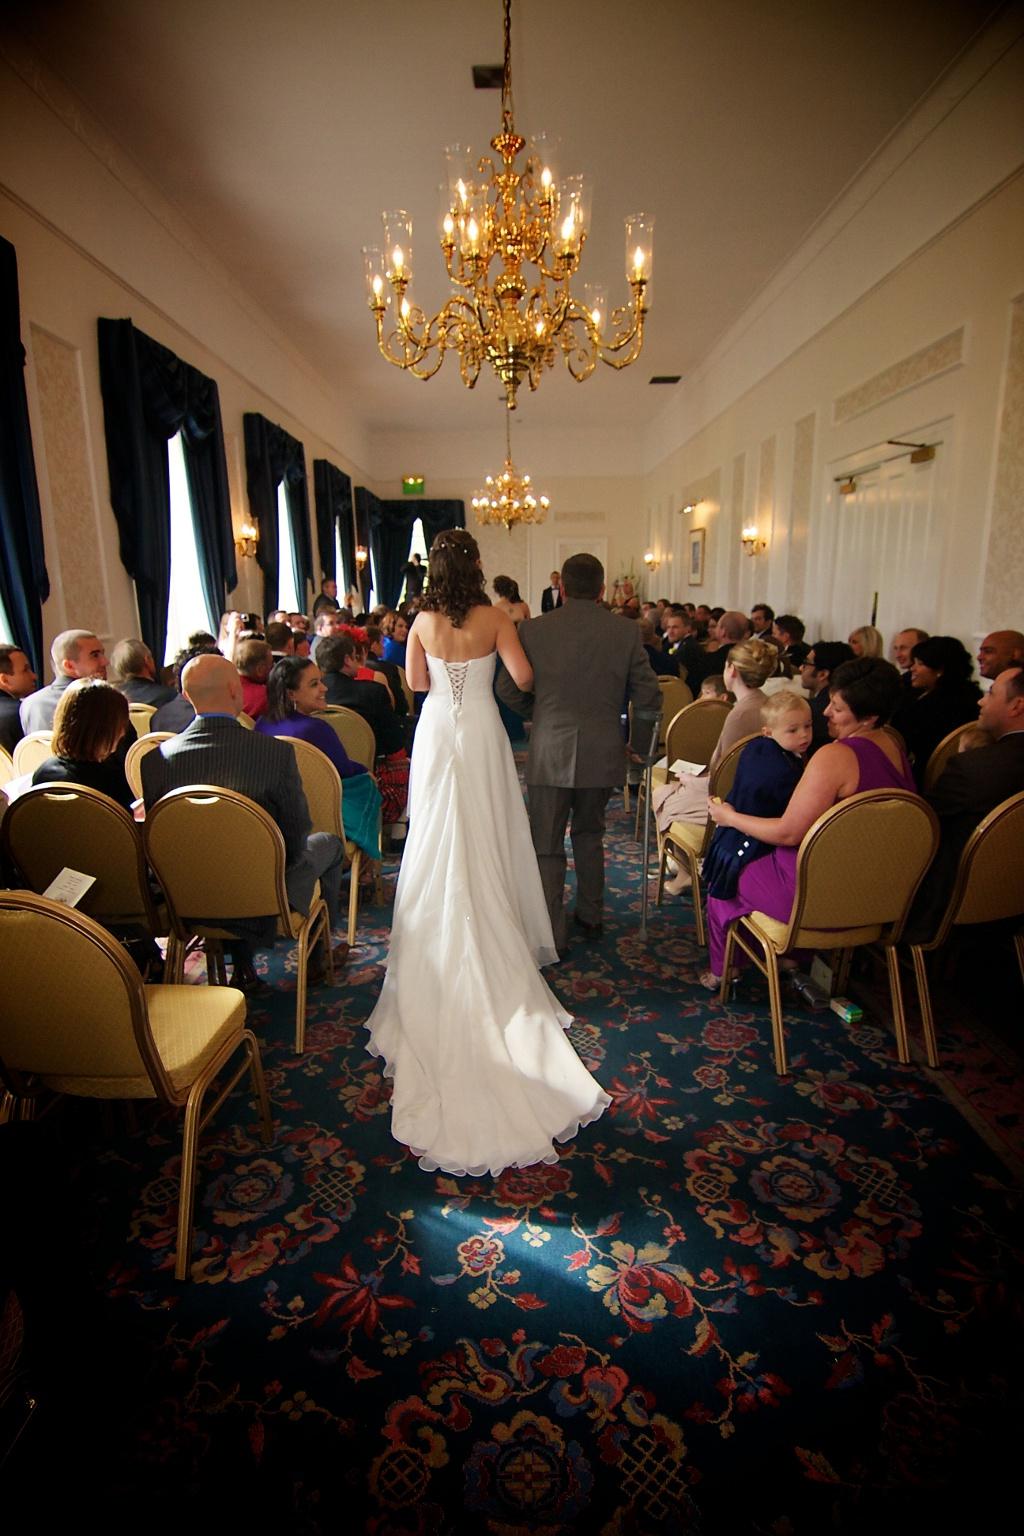 Scottish wedding ceremonies personal scottish wedding ceremonies ceremony junglespirit Image collections